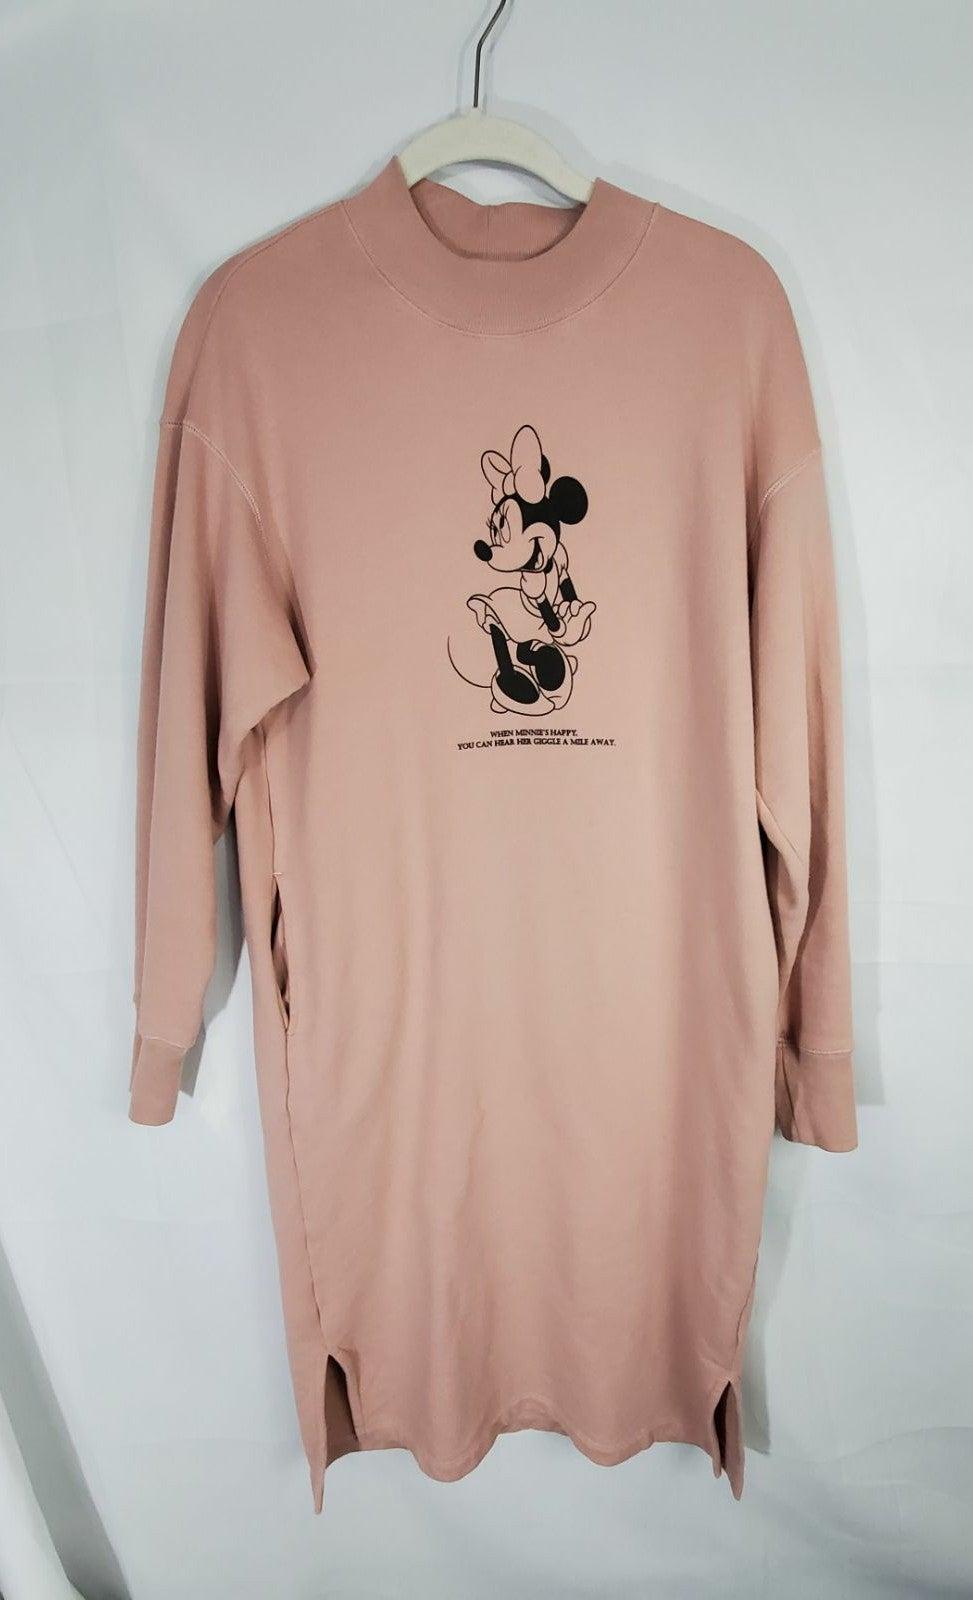 Uniqlo Mini Mouse Sweatshirt Dress XS